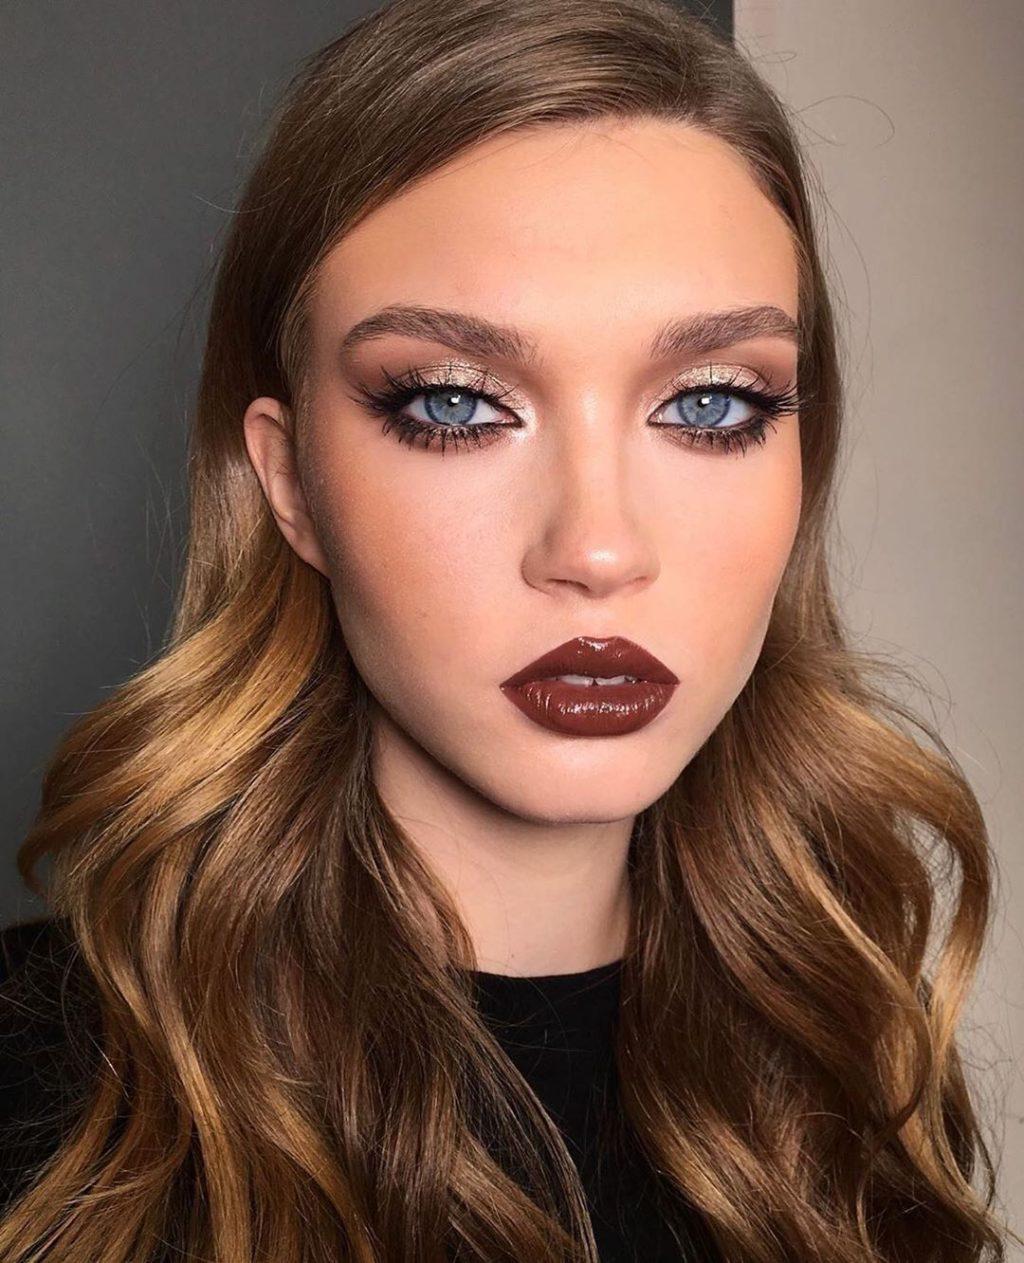 Golden-Smokey-Eye-make-up-3-1024x1263 60+ Hottest Smokey Eye Makeup Looks in 2020